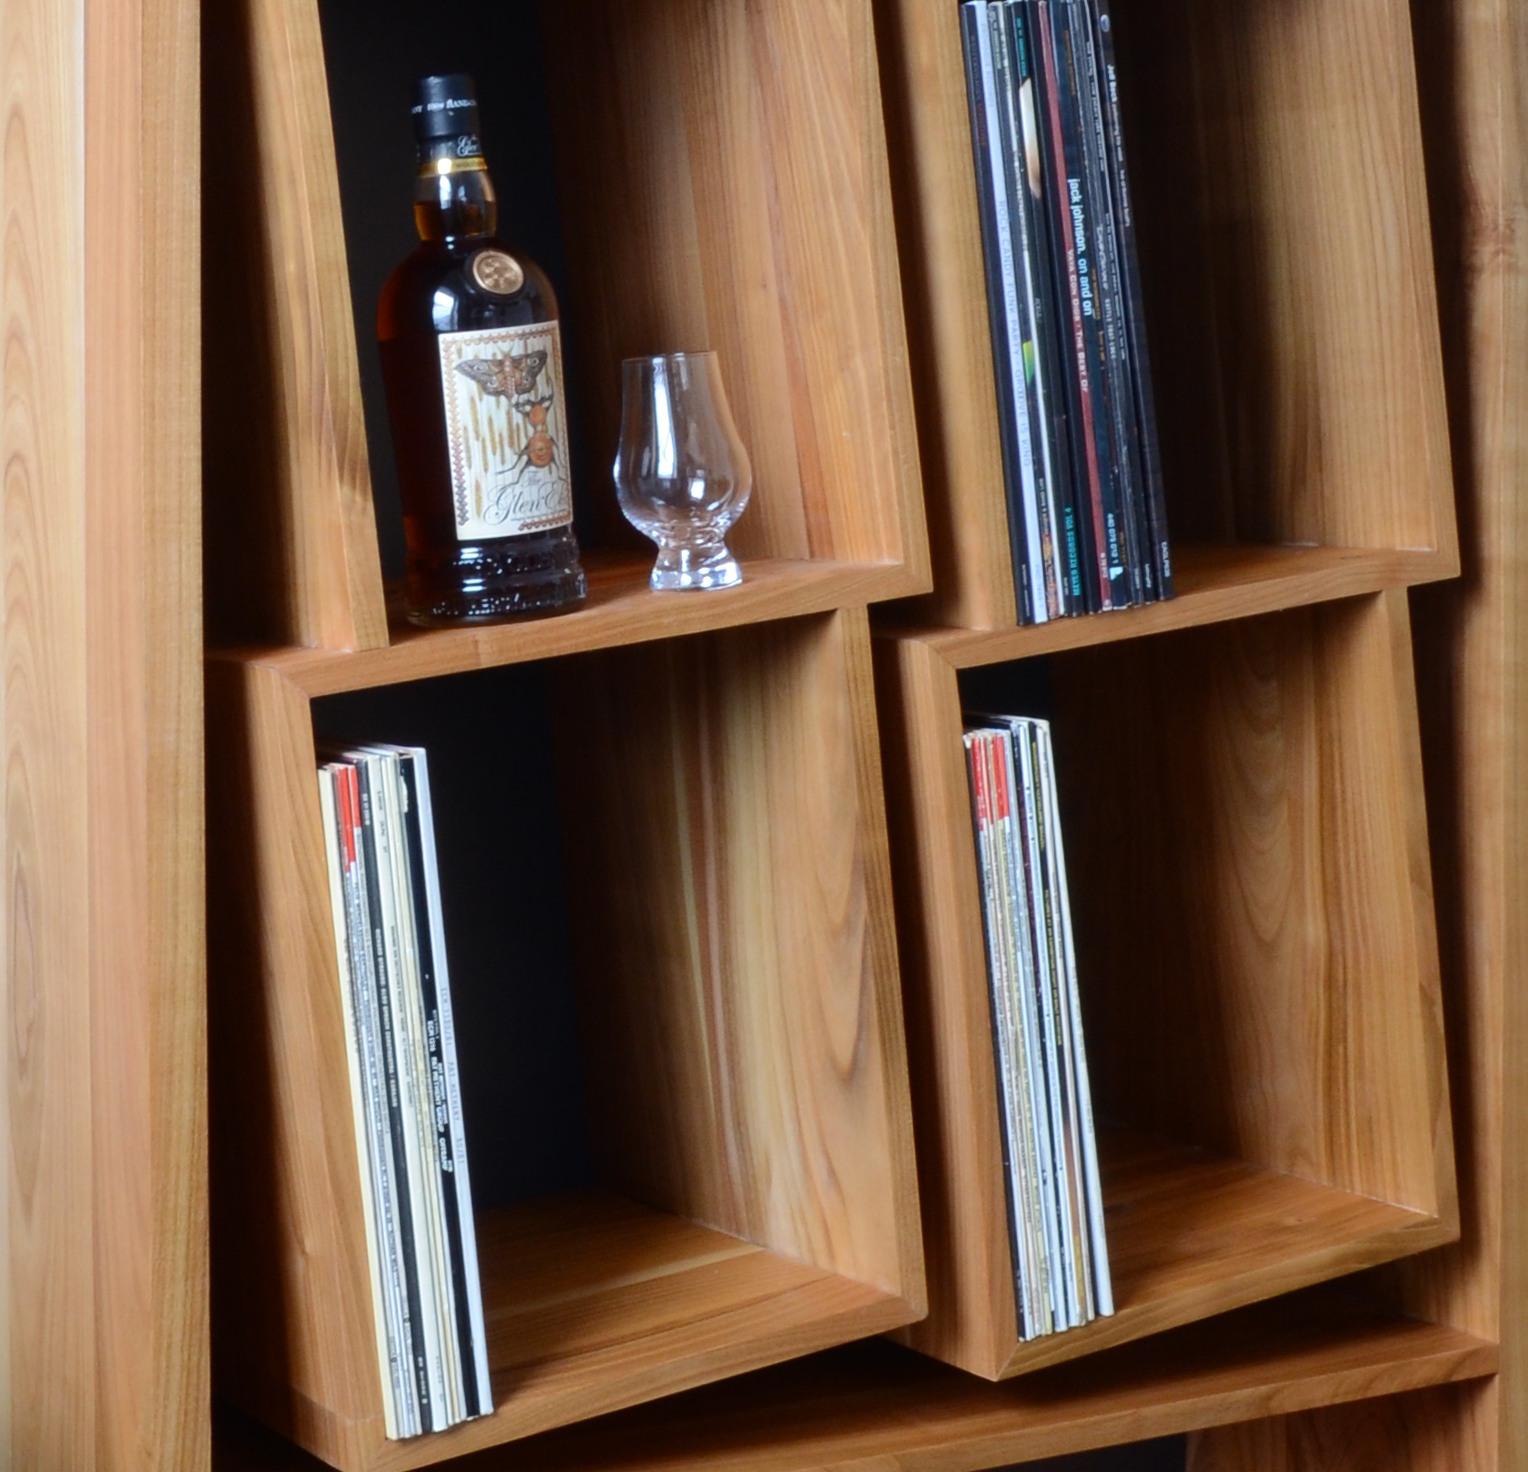 Schallplatten Regal - Sinfonic Audio baut das geniale Schallplattenregal